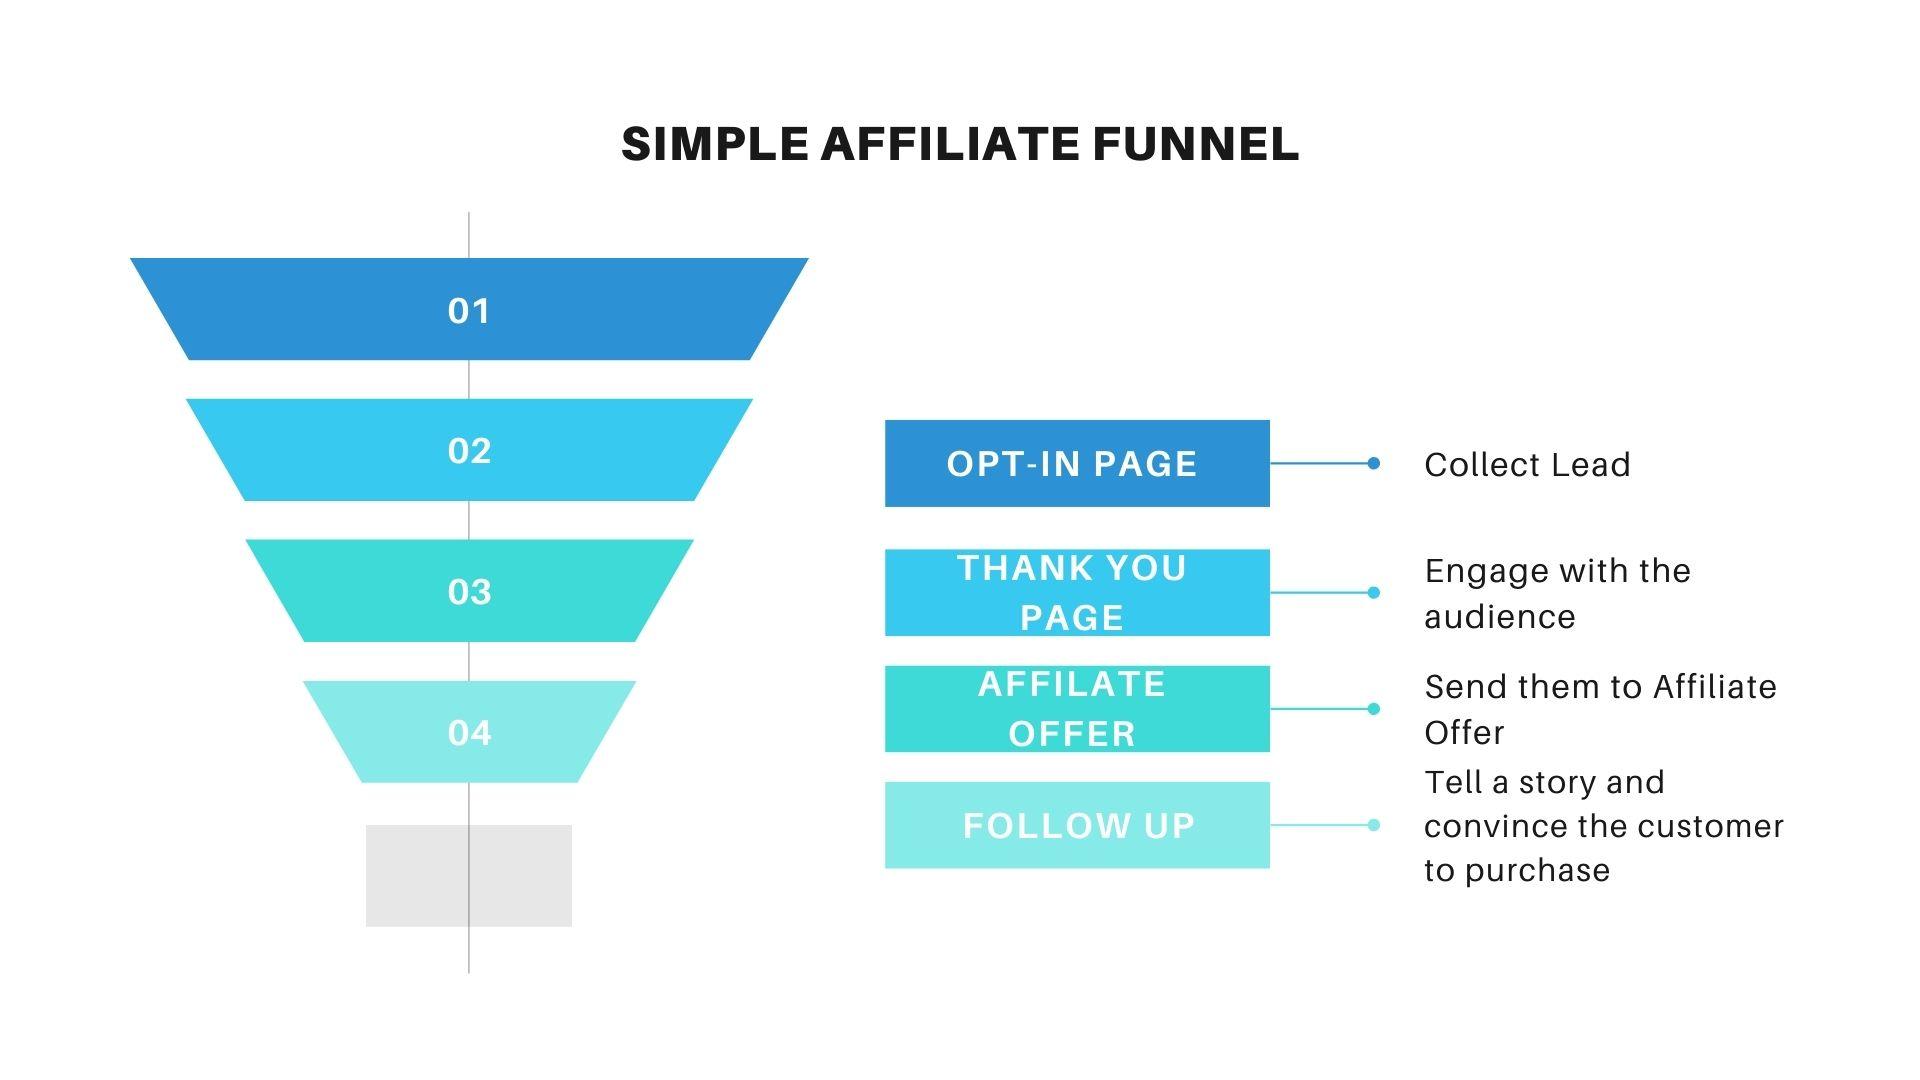 affiliate marketi ng funnel